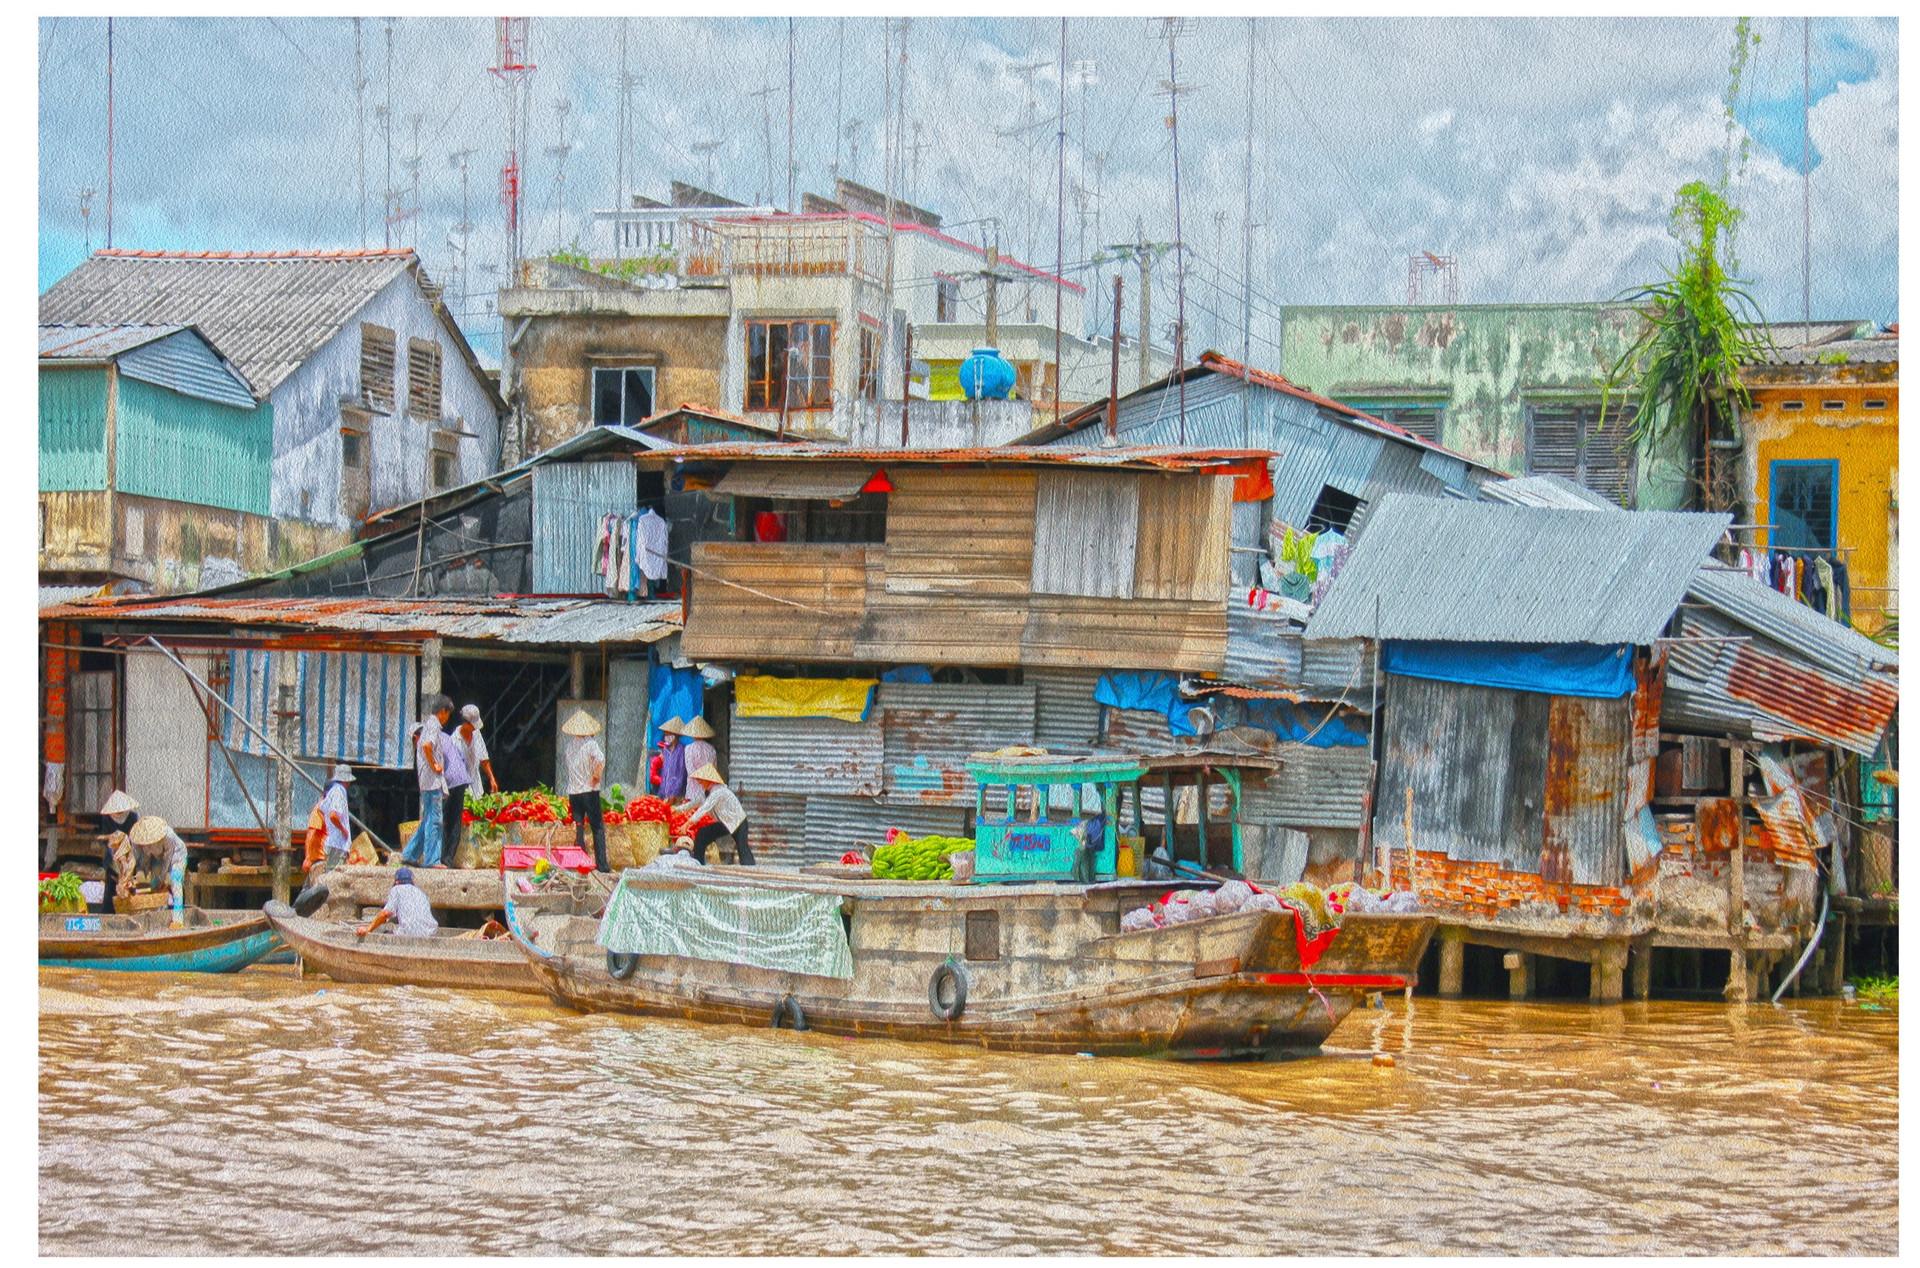 Floated Market, Vietnam